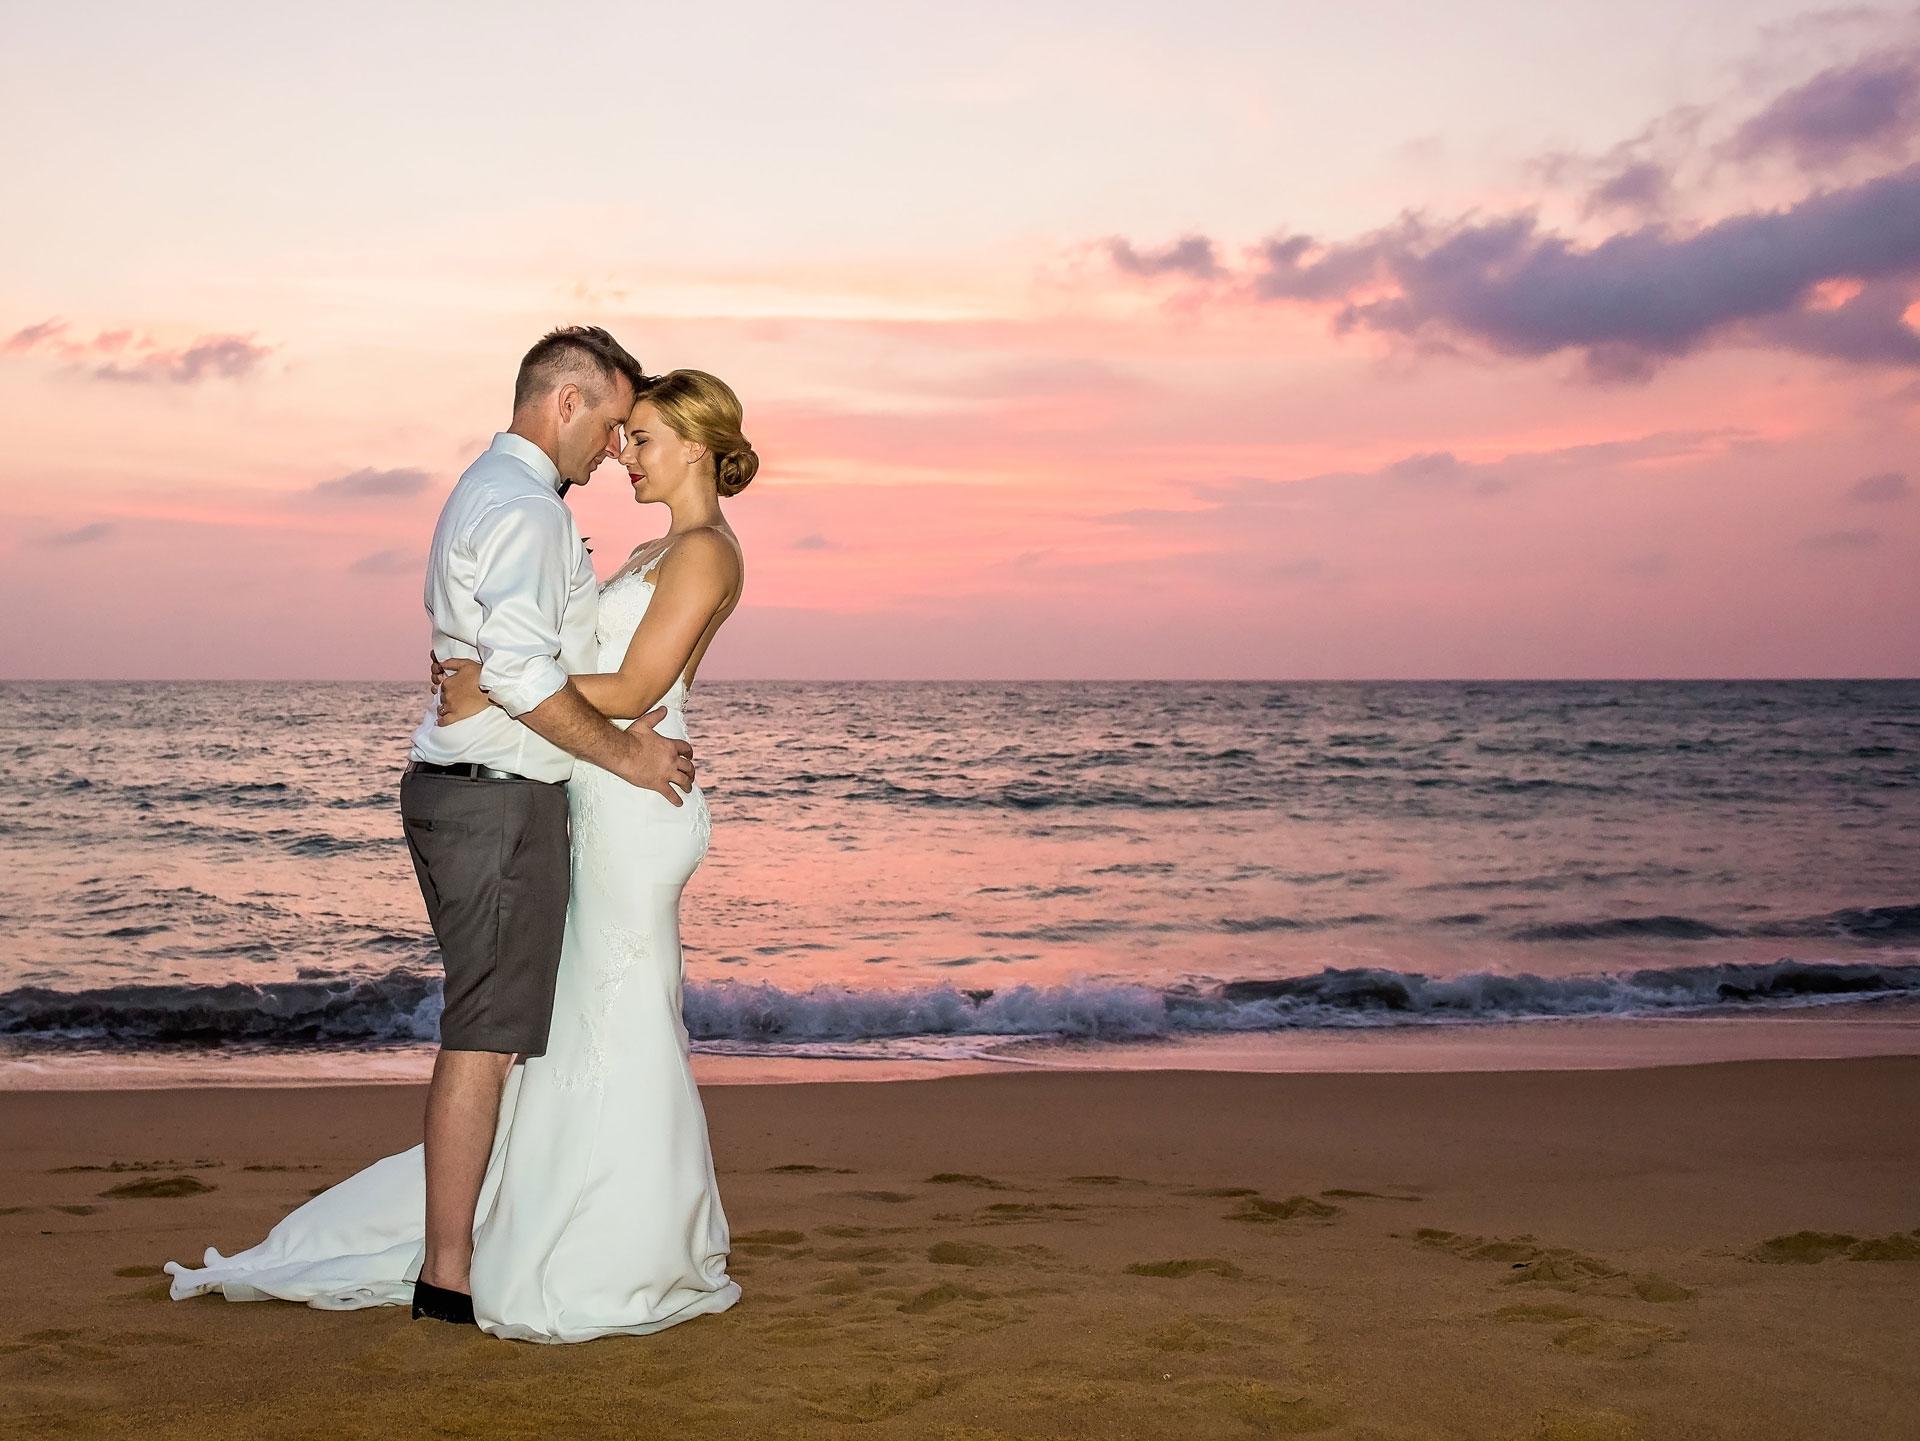 thailand-destination-beach-wedding-main.jpg